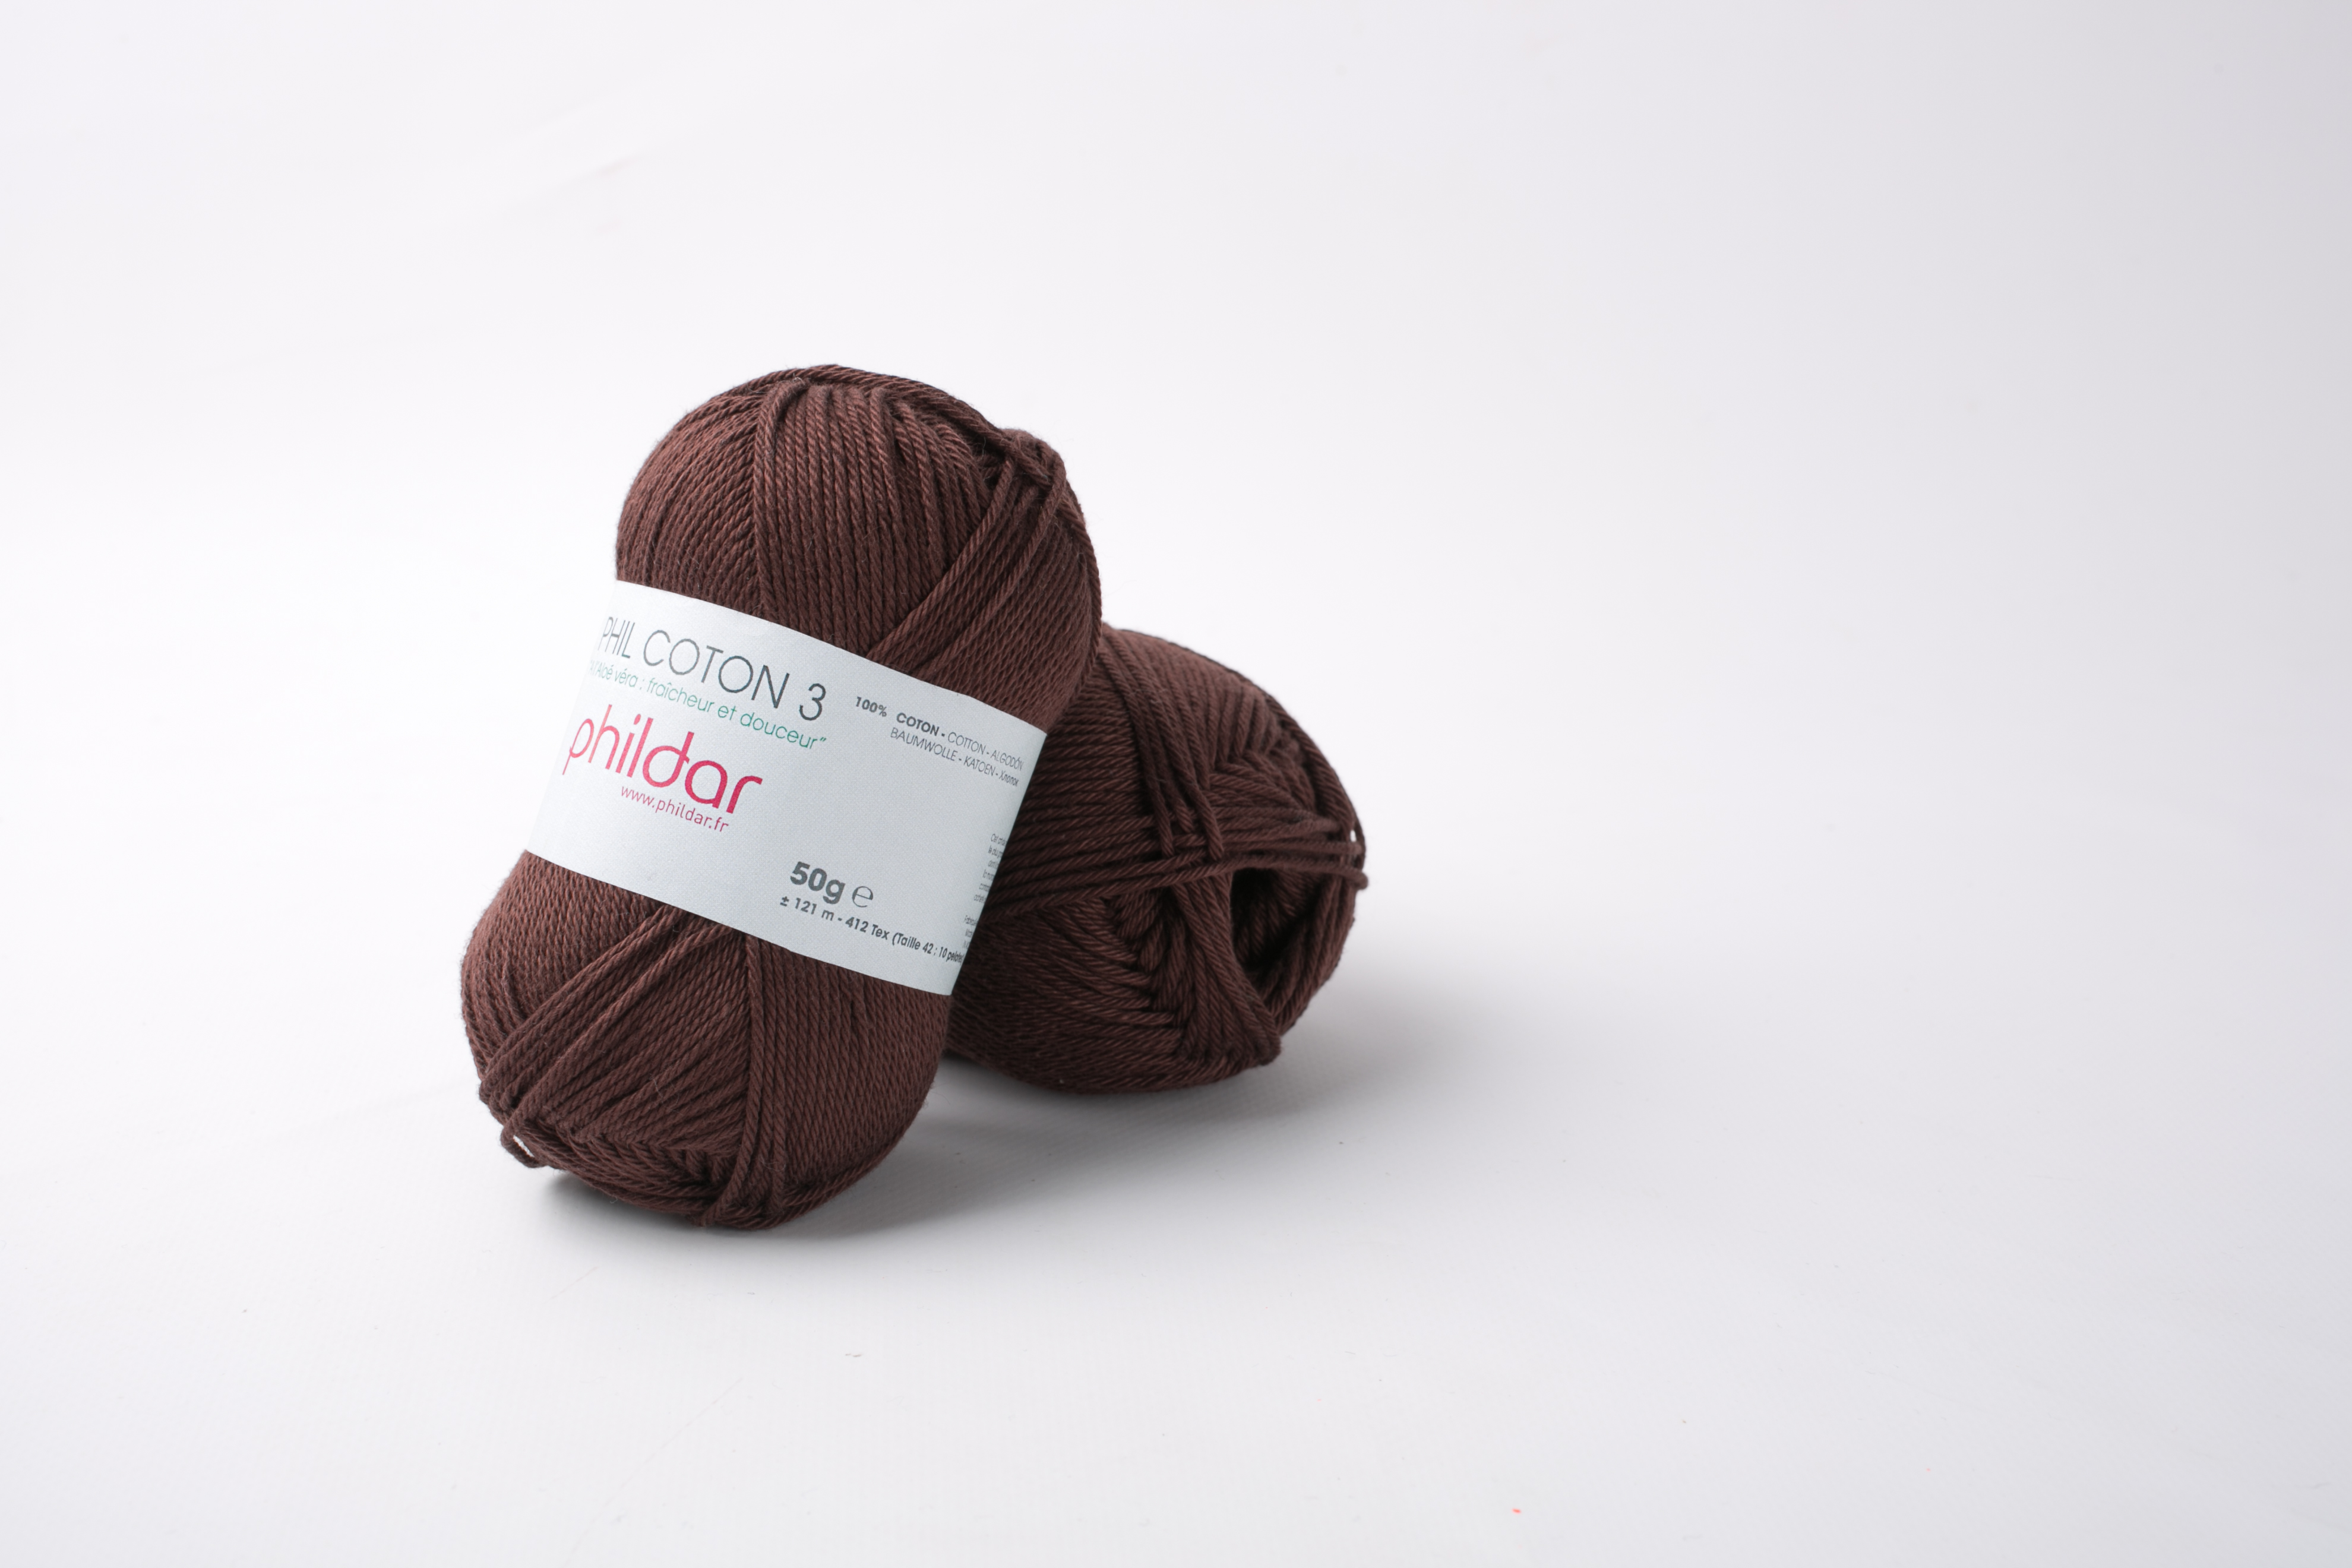 Phildar coton 3 1164 marron